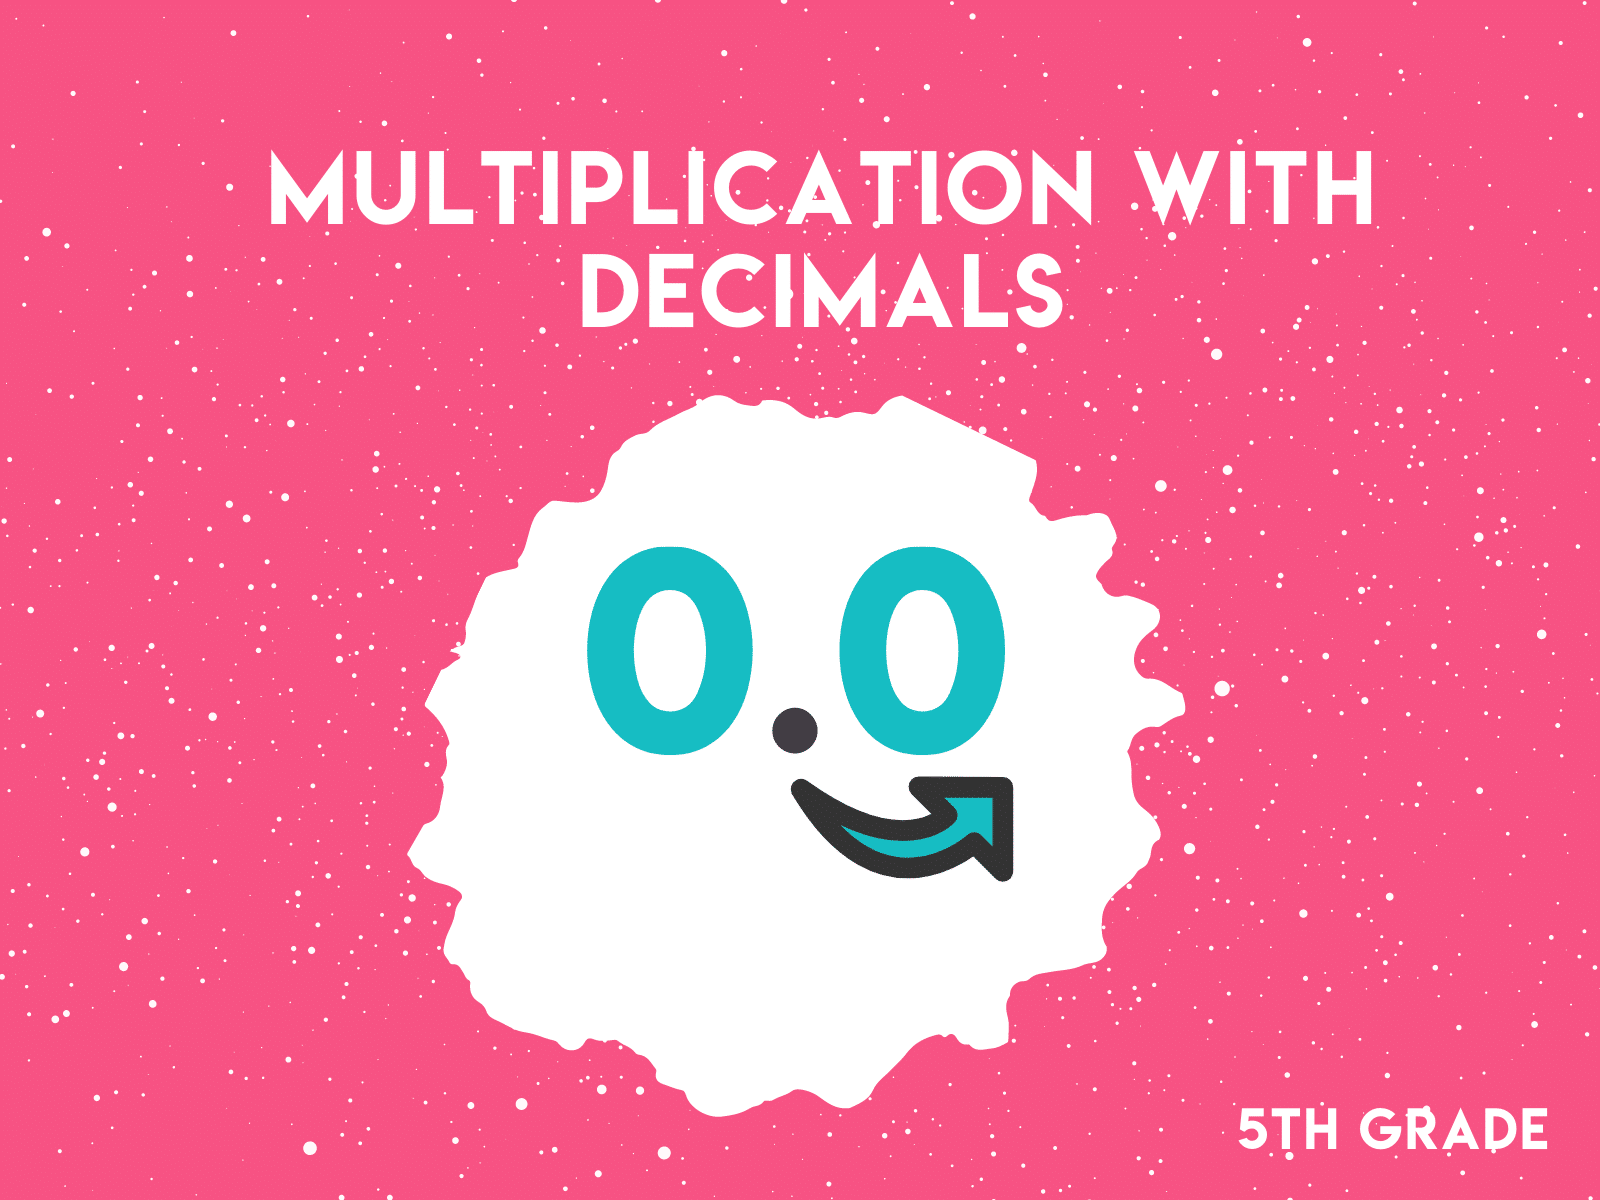 Multiplication with decimals 5th grade math workbook.